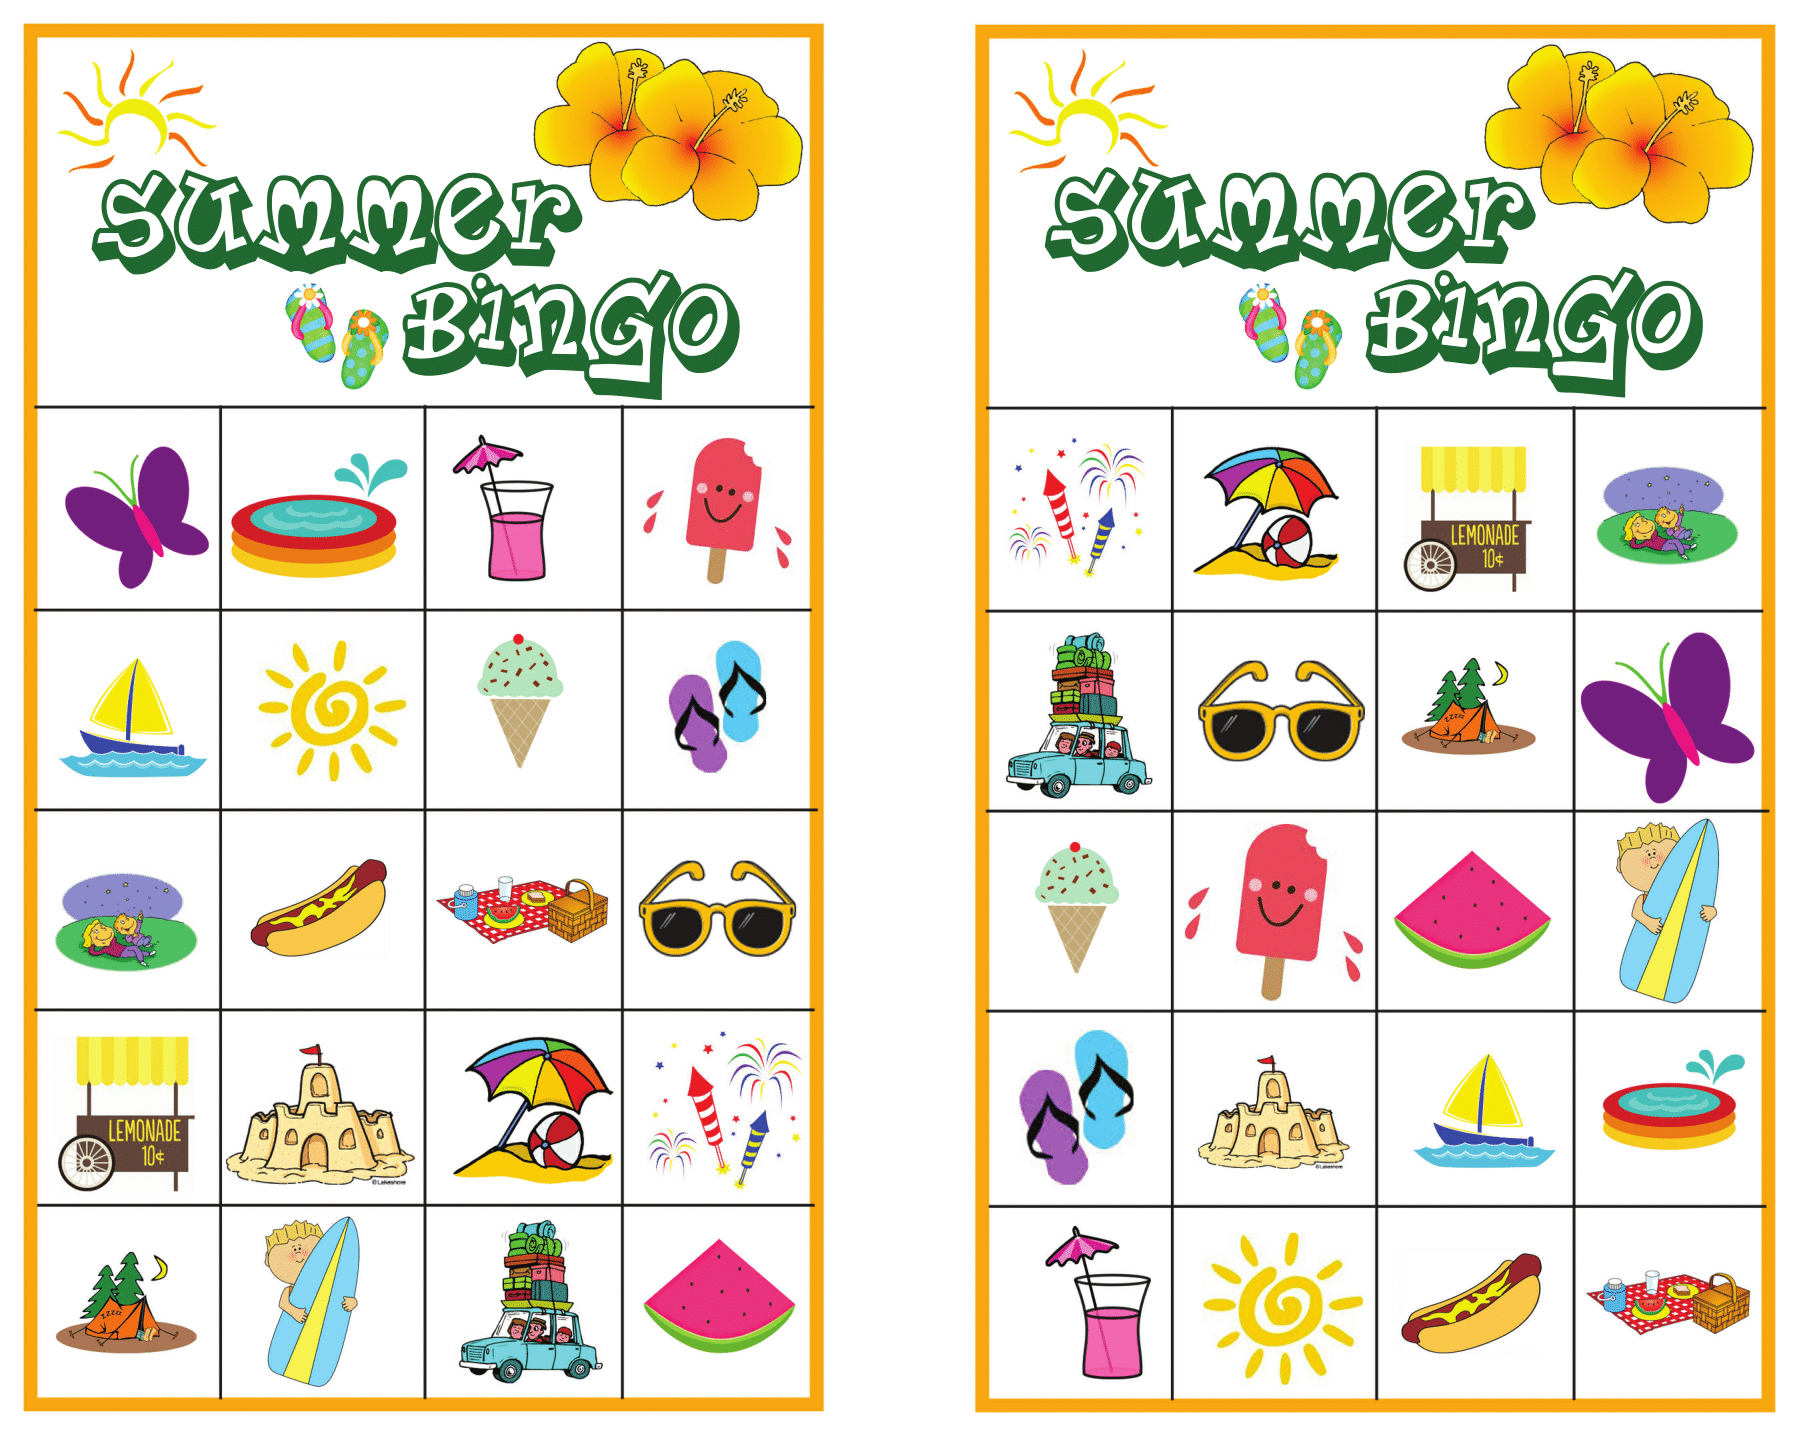 Summer Bingo Game With Free Printables | Bingo Games Free